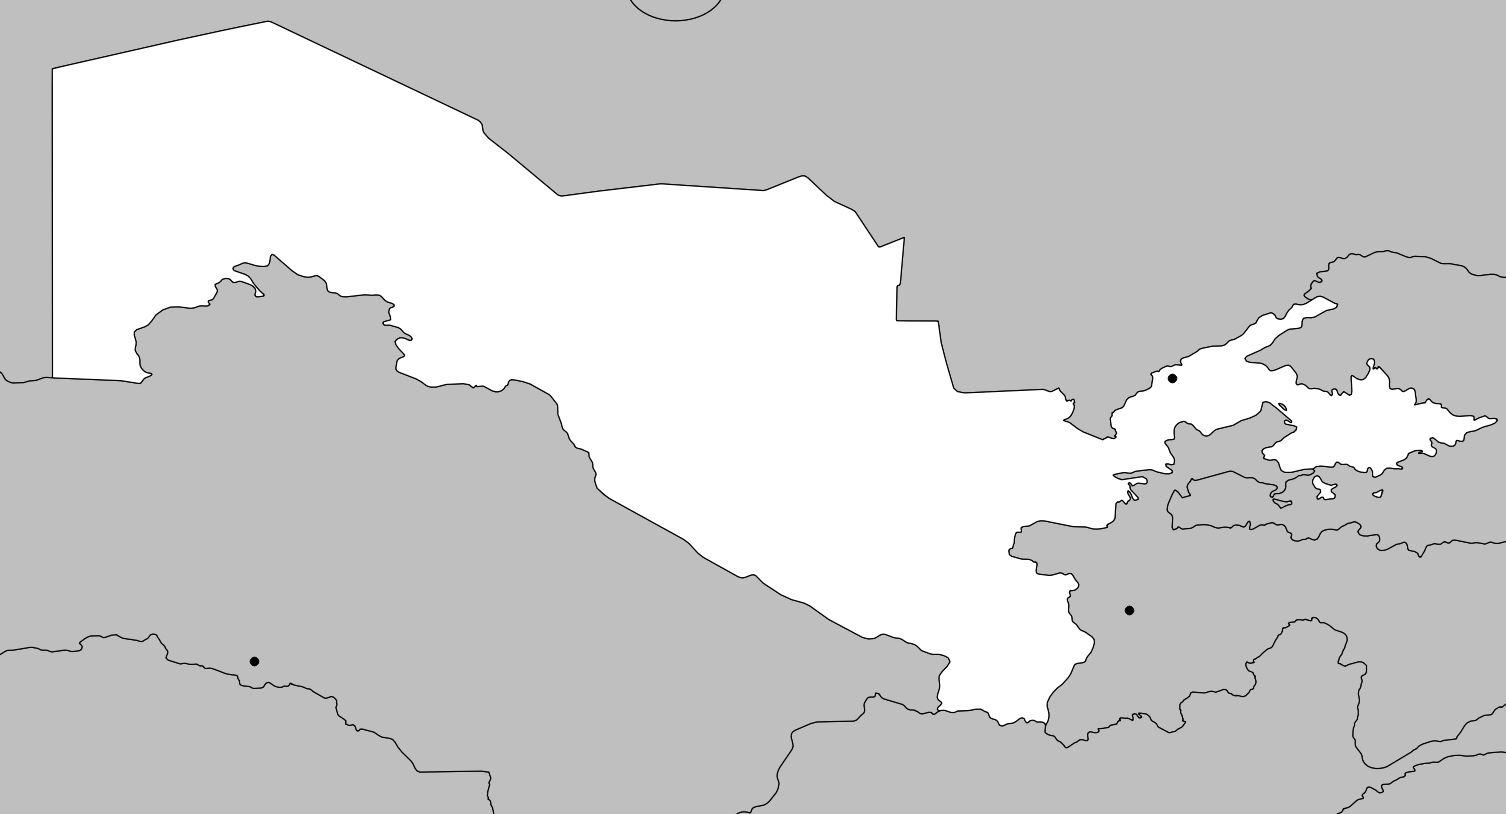 Carte vierge de l'Ouzbékistan